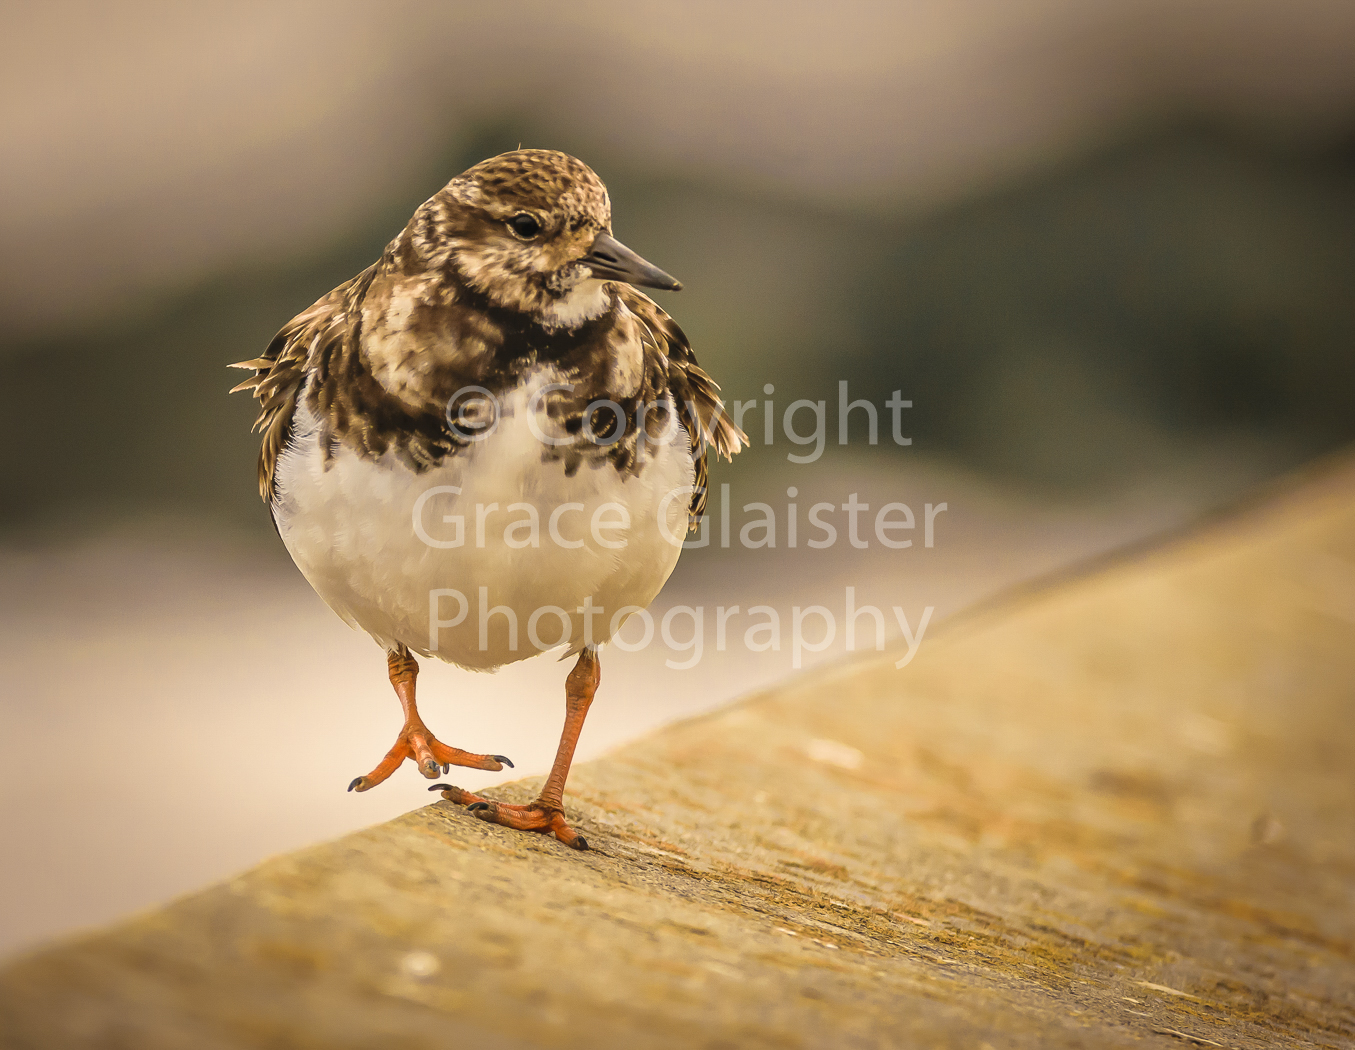 Turnstone by Grace Glaister